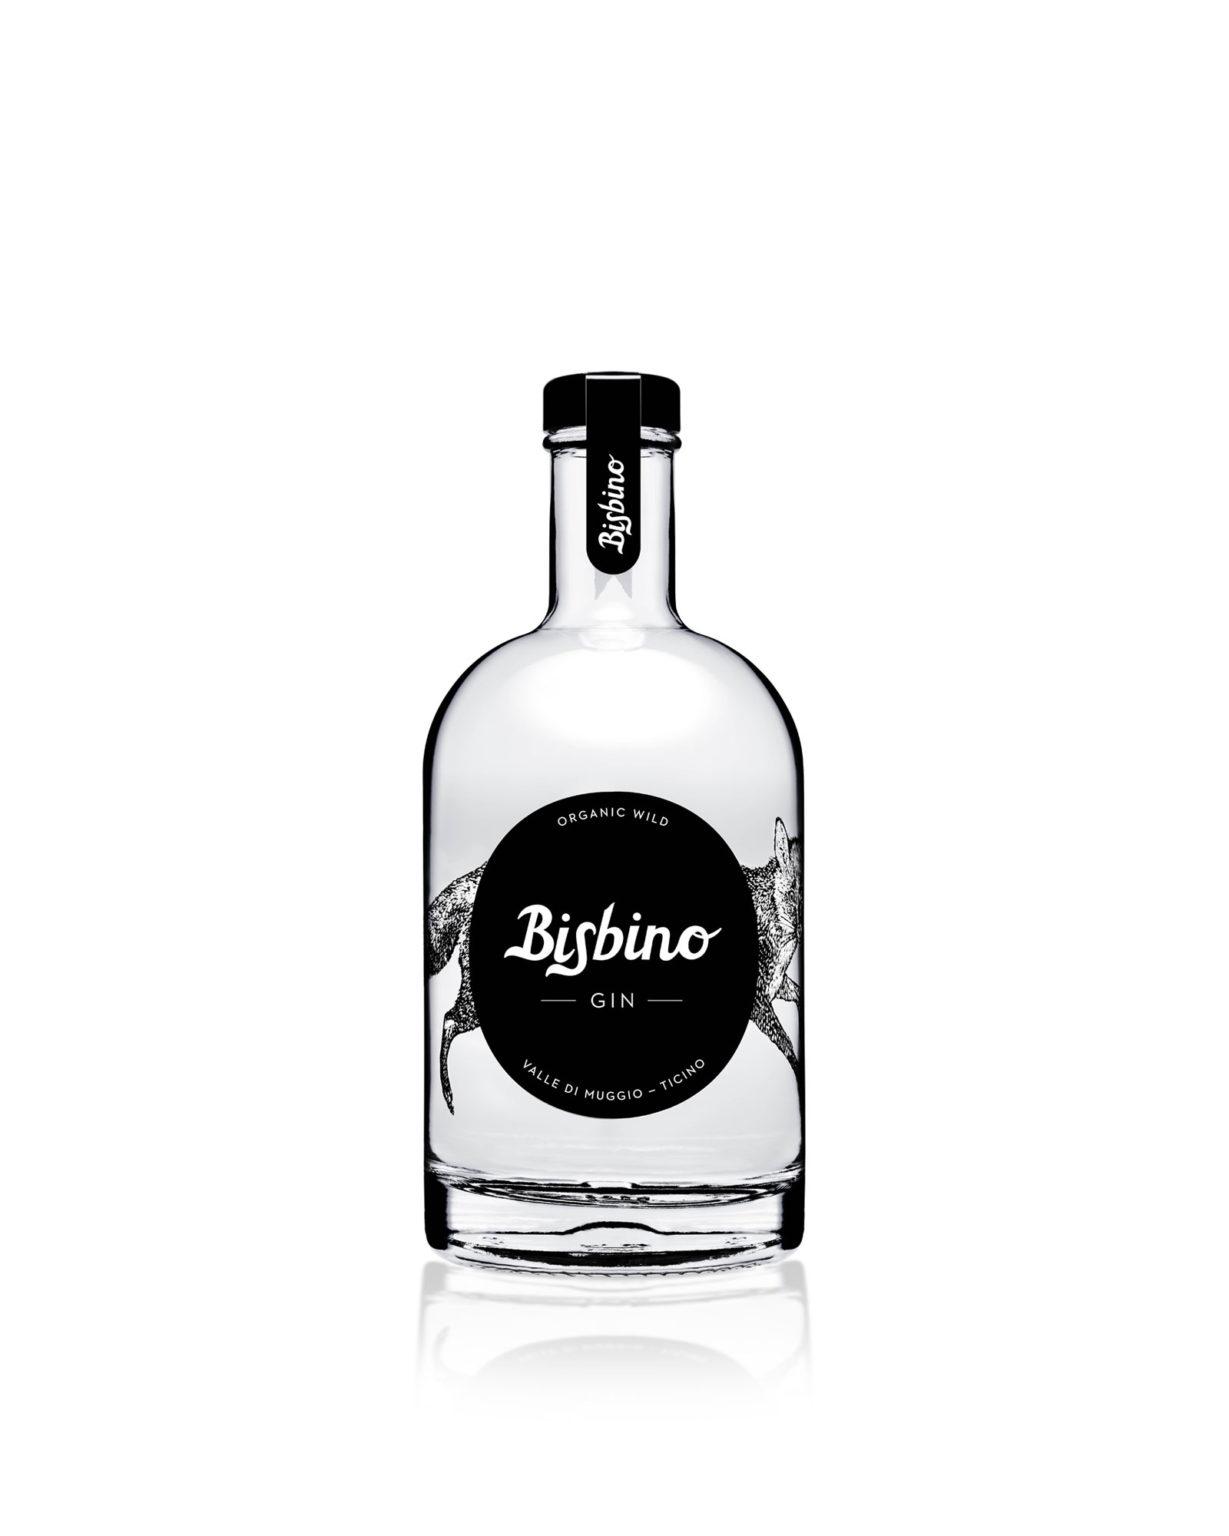 bisbino-gin-50cl-closeup